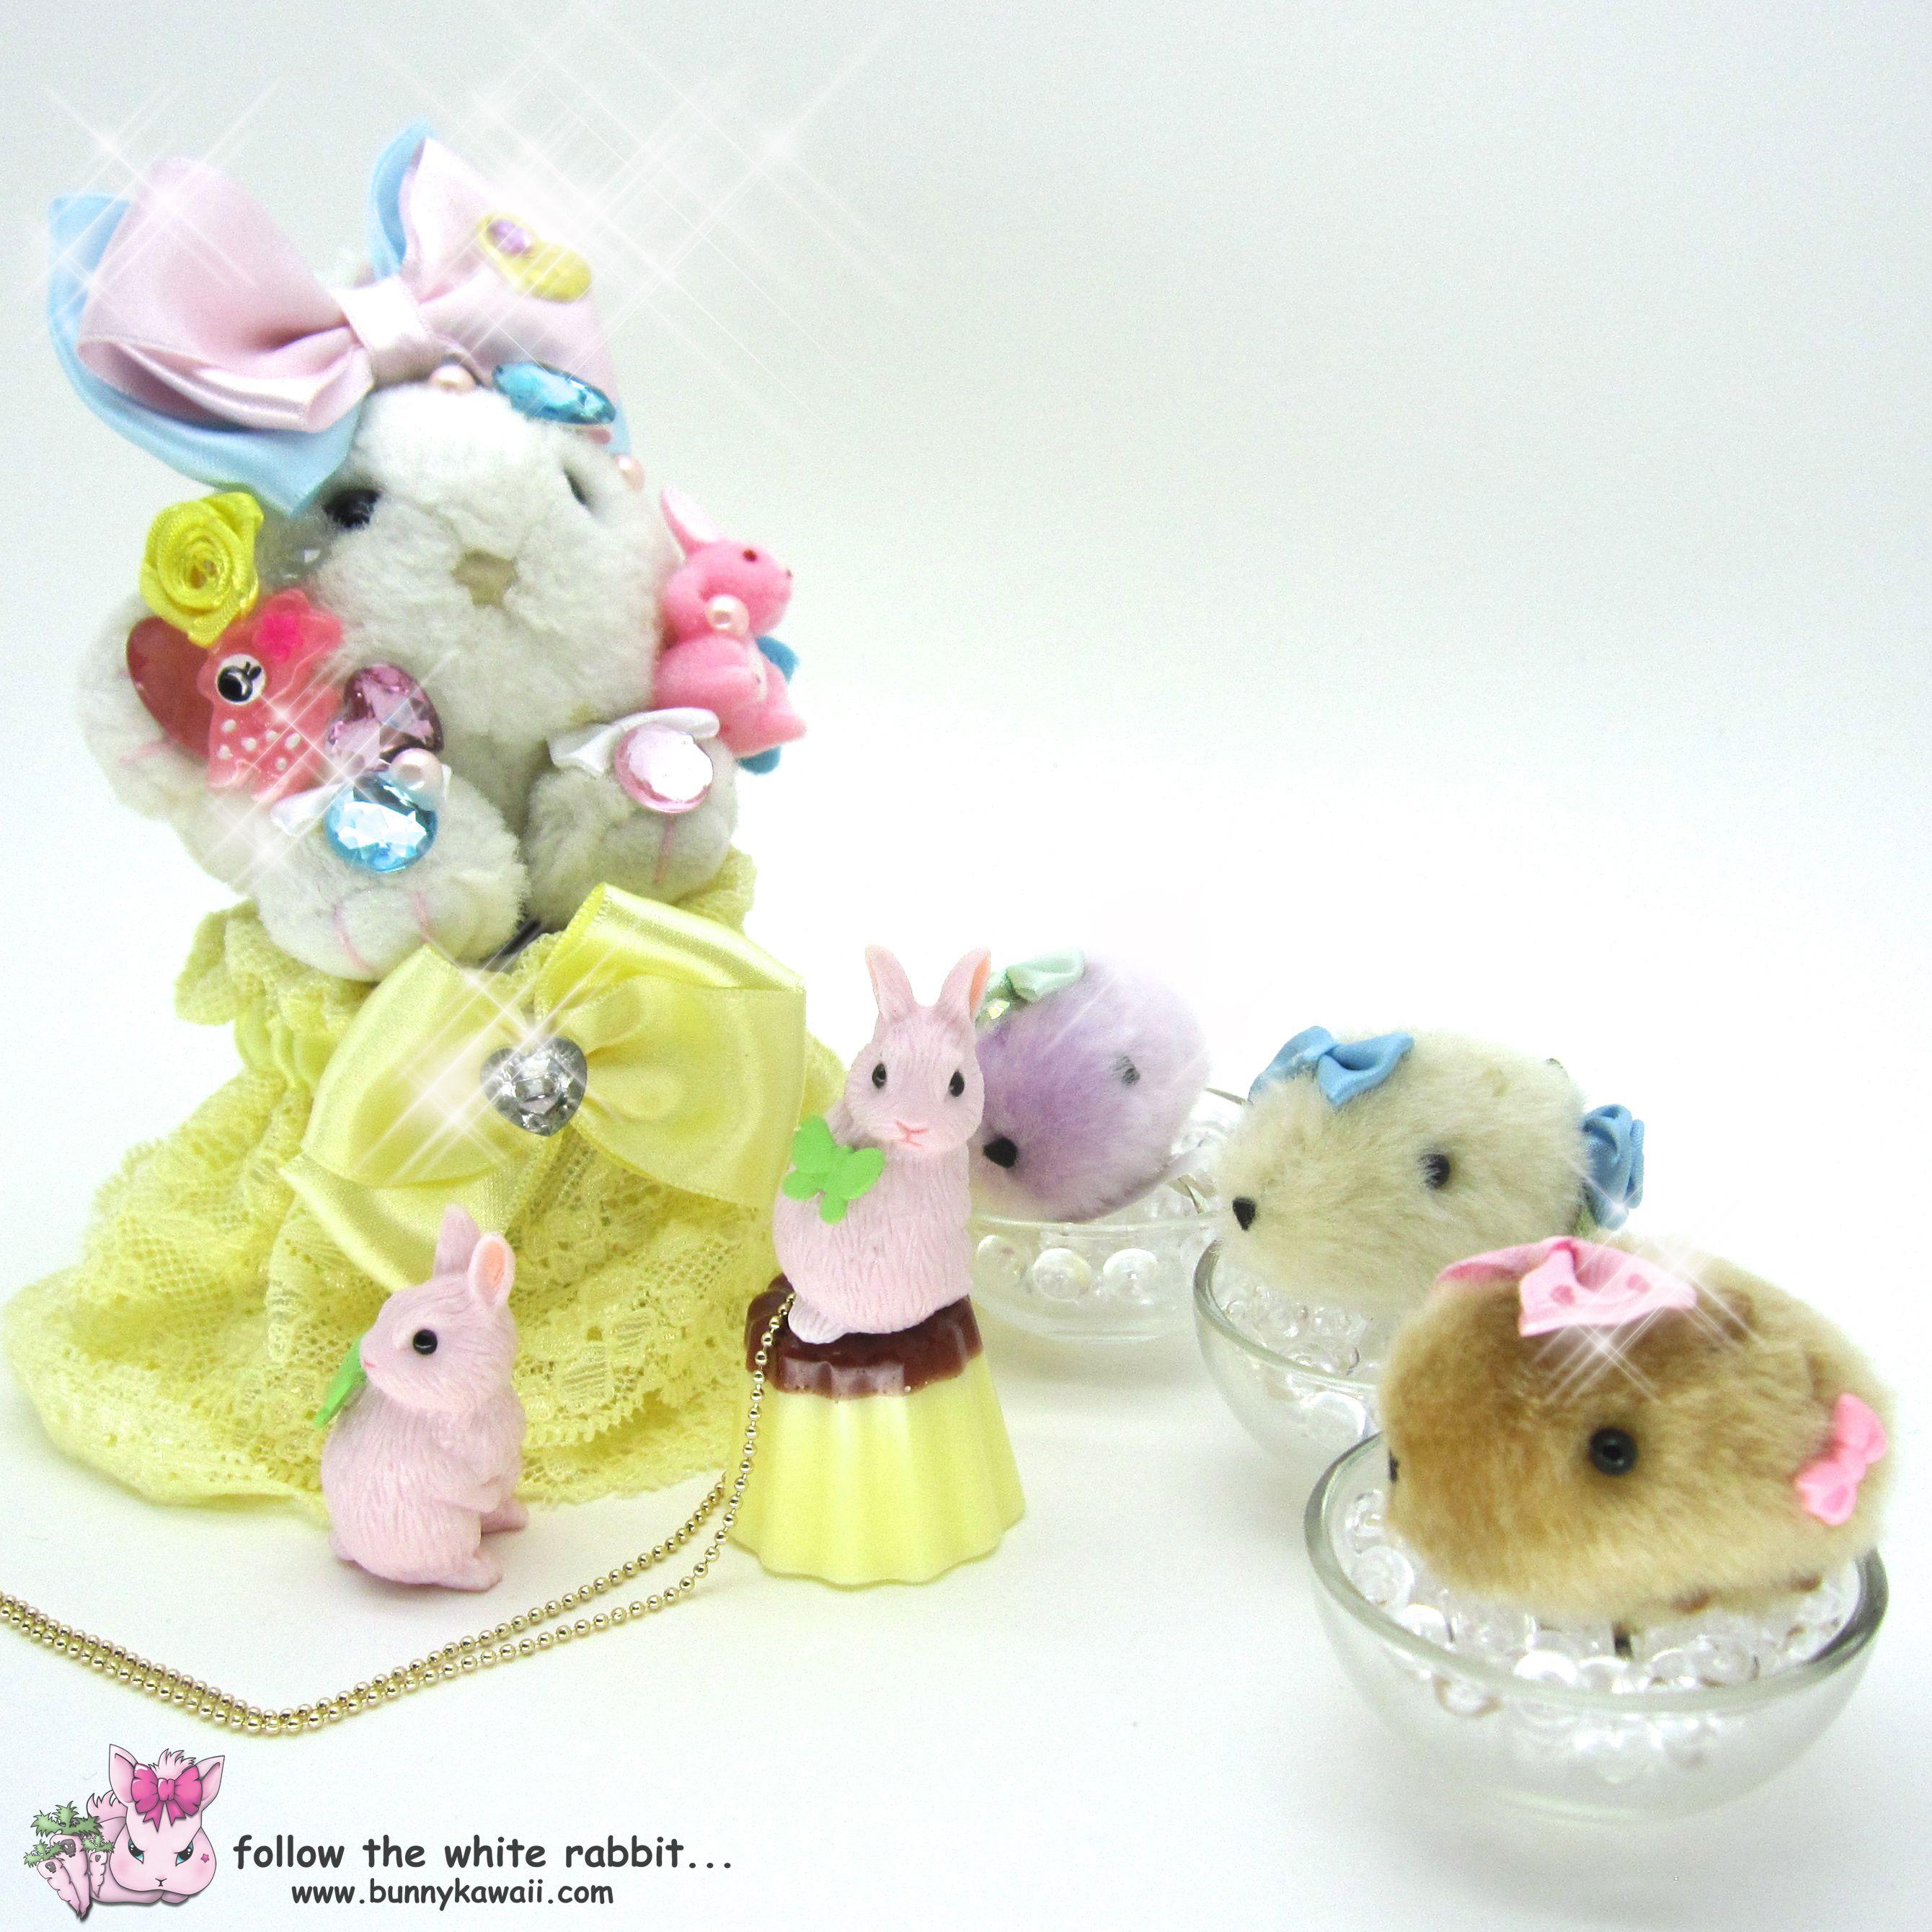 sweet lolita - fairy kei - harajuku jewelry & accessories by Follow the white rabbit...  <3 www.bunnykawaii.com